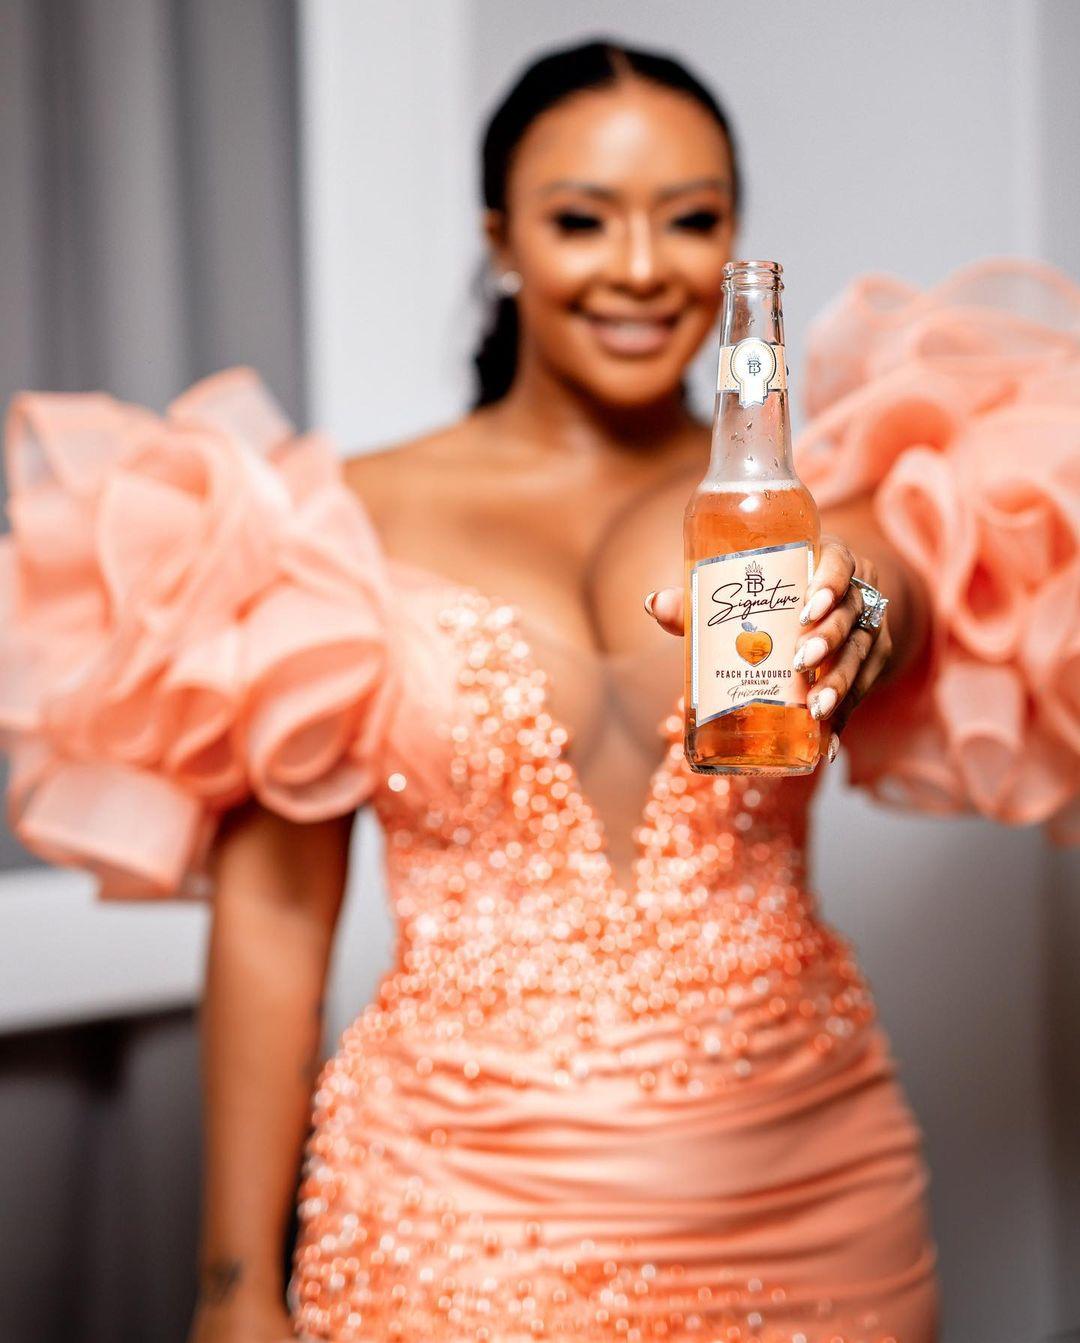 Mzansi reacts to shocking price of Boity's alcoholic drink